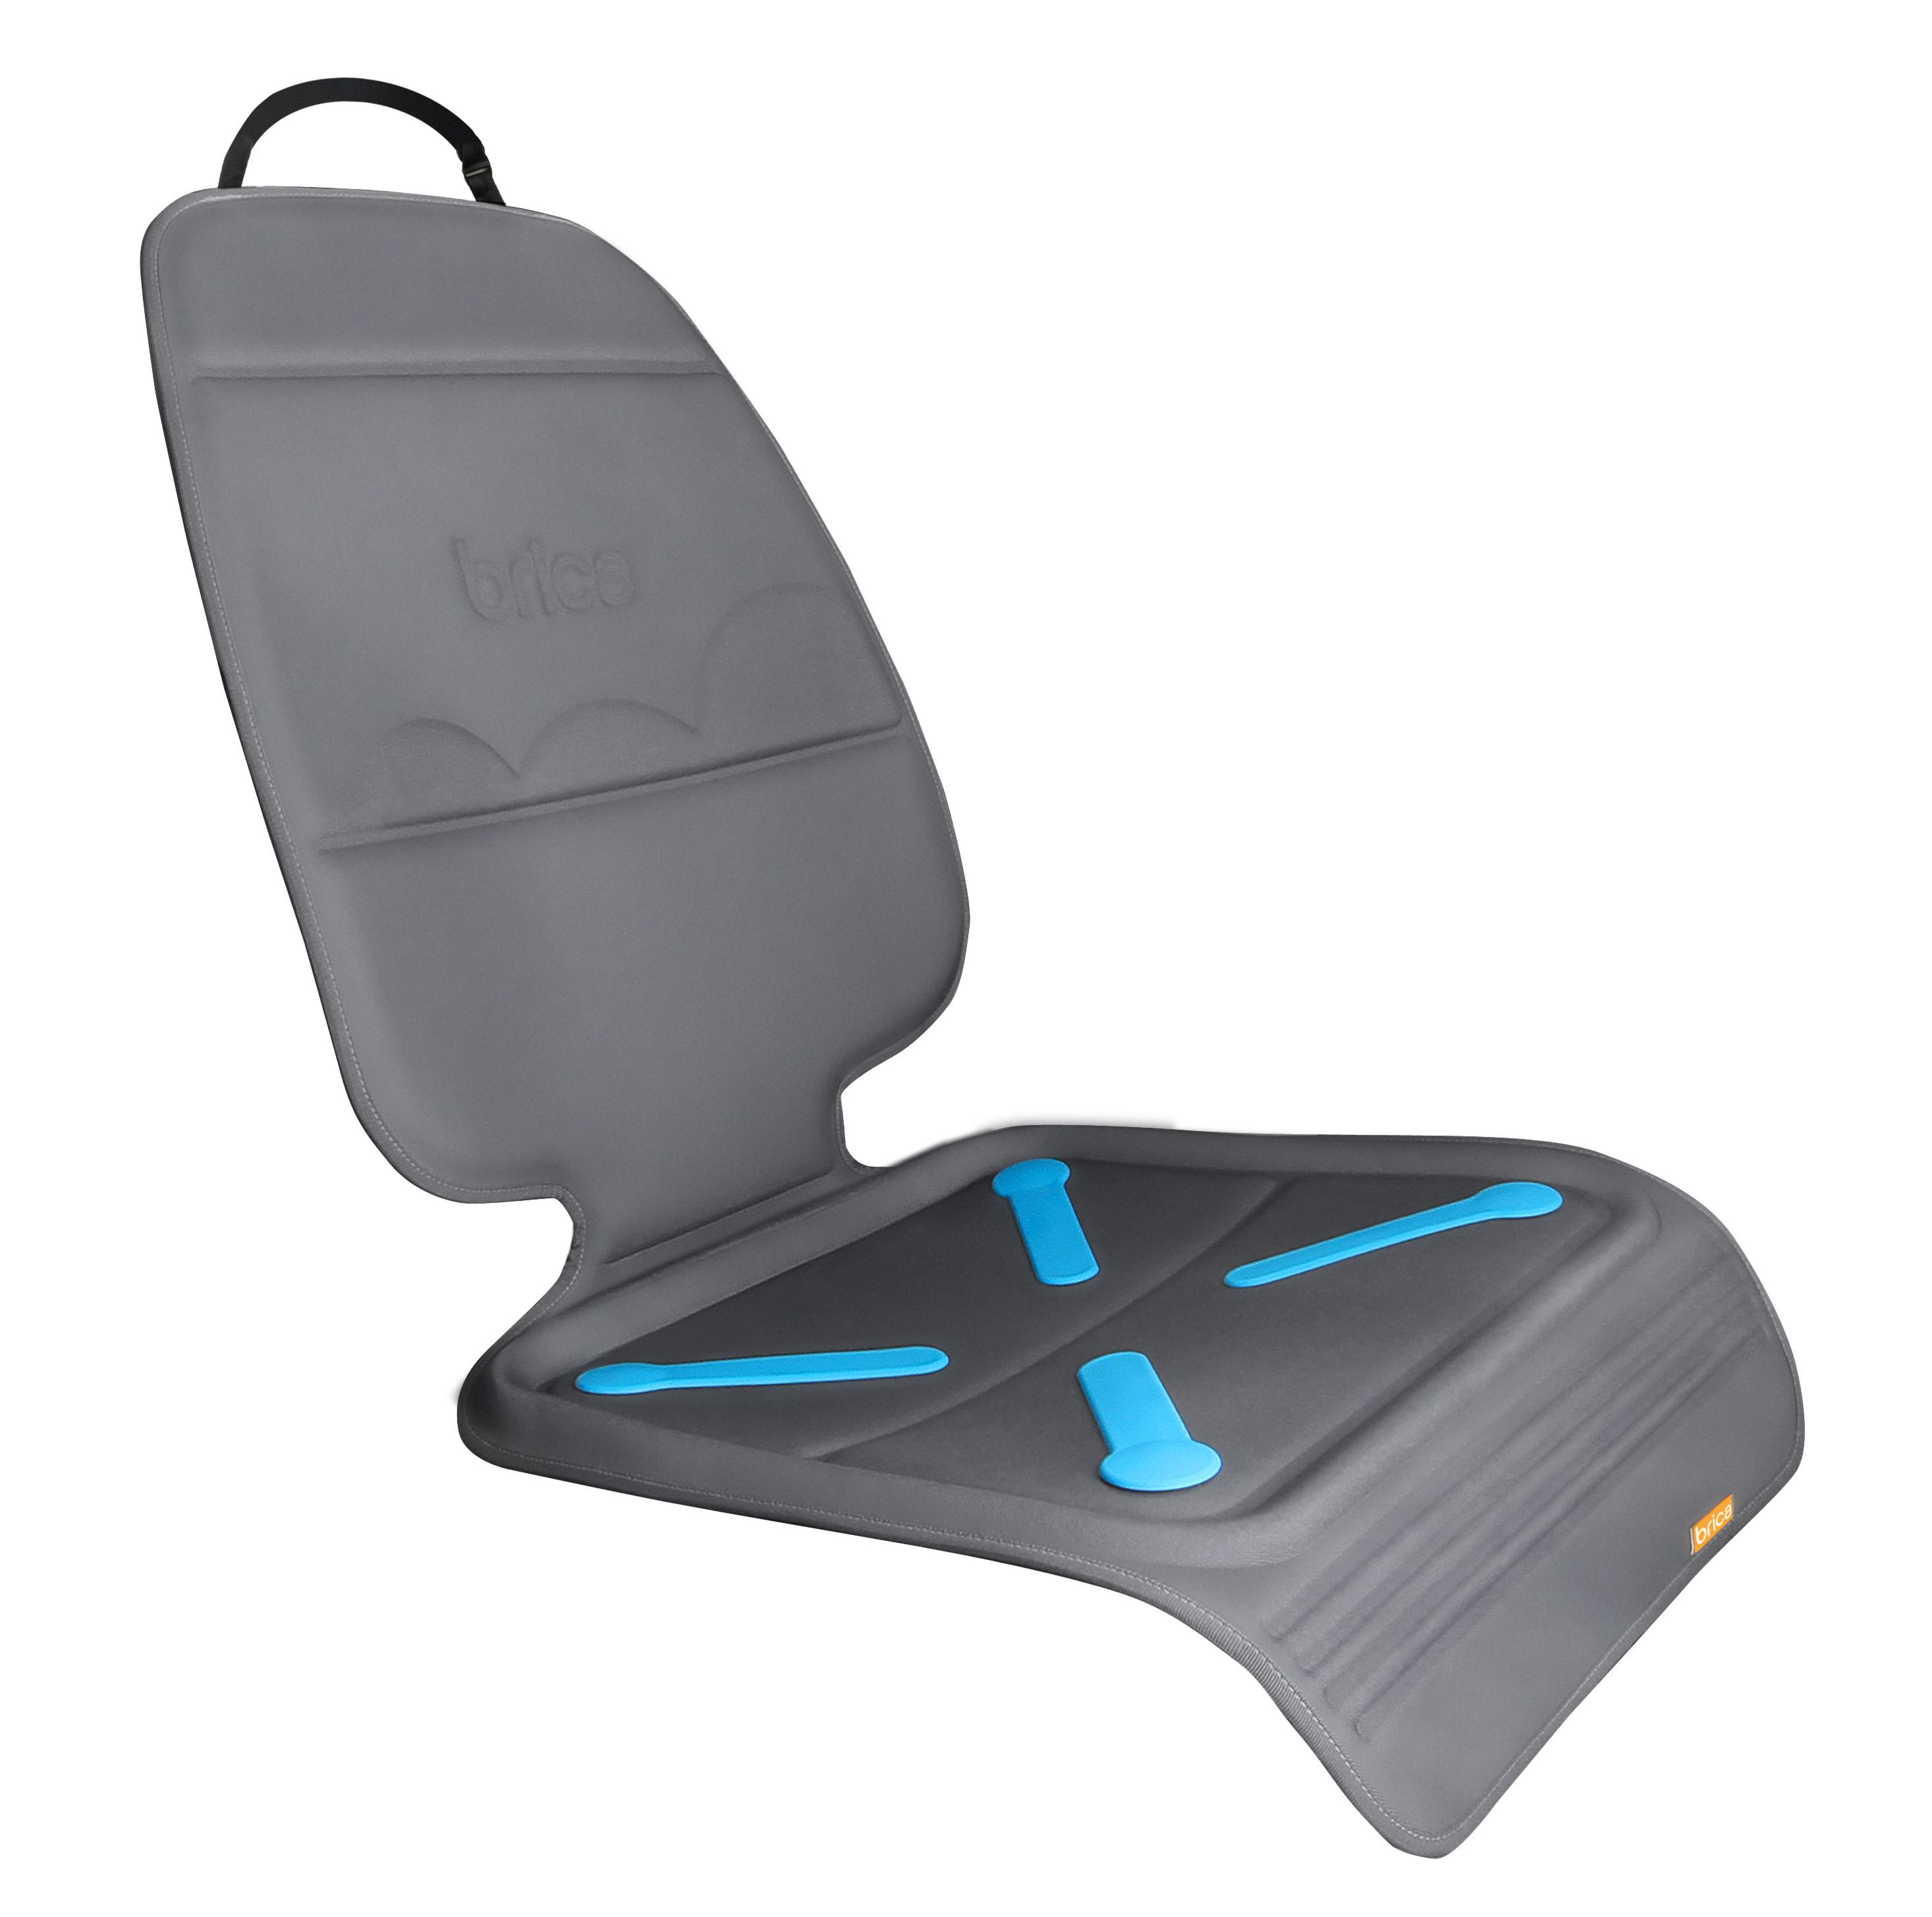 Amazon.com: Brica Seat Guardian Car Seat Protector: Baby